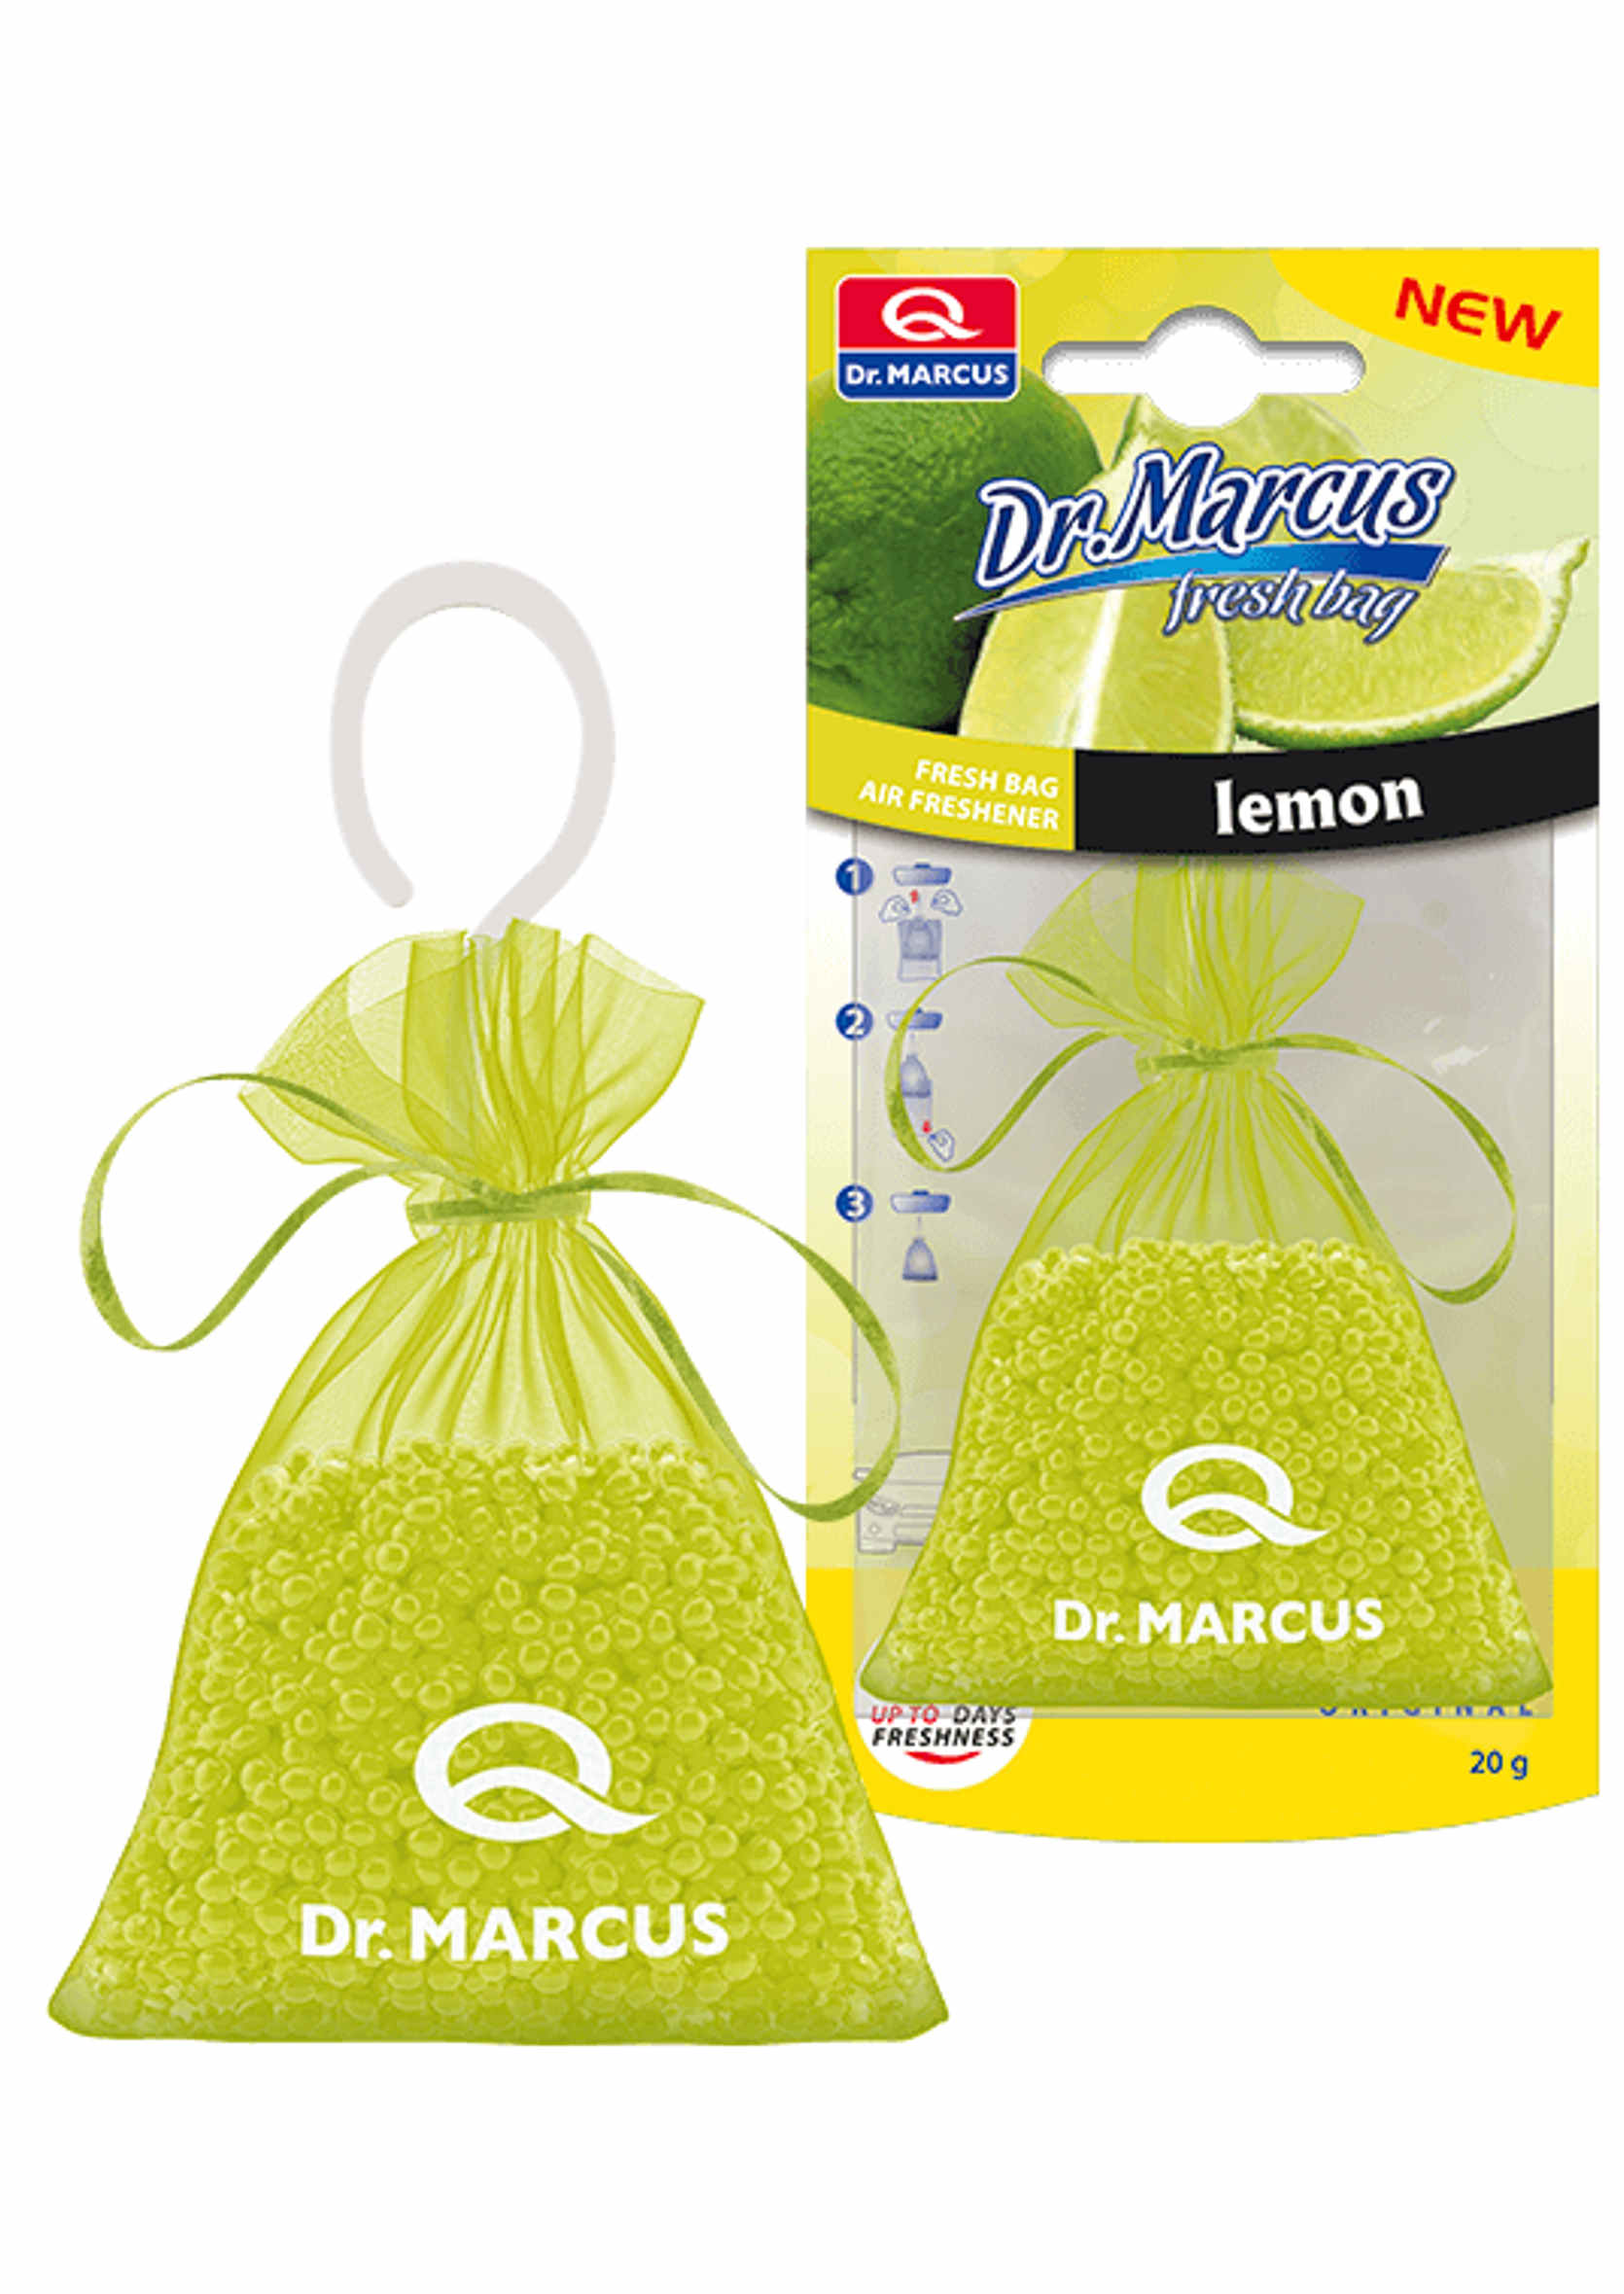 Dr. Marcus Fresh Bag Lemon 20g Woreczek Zapachowy Cytryna